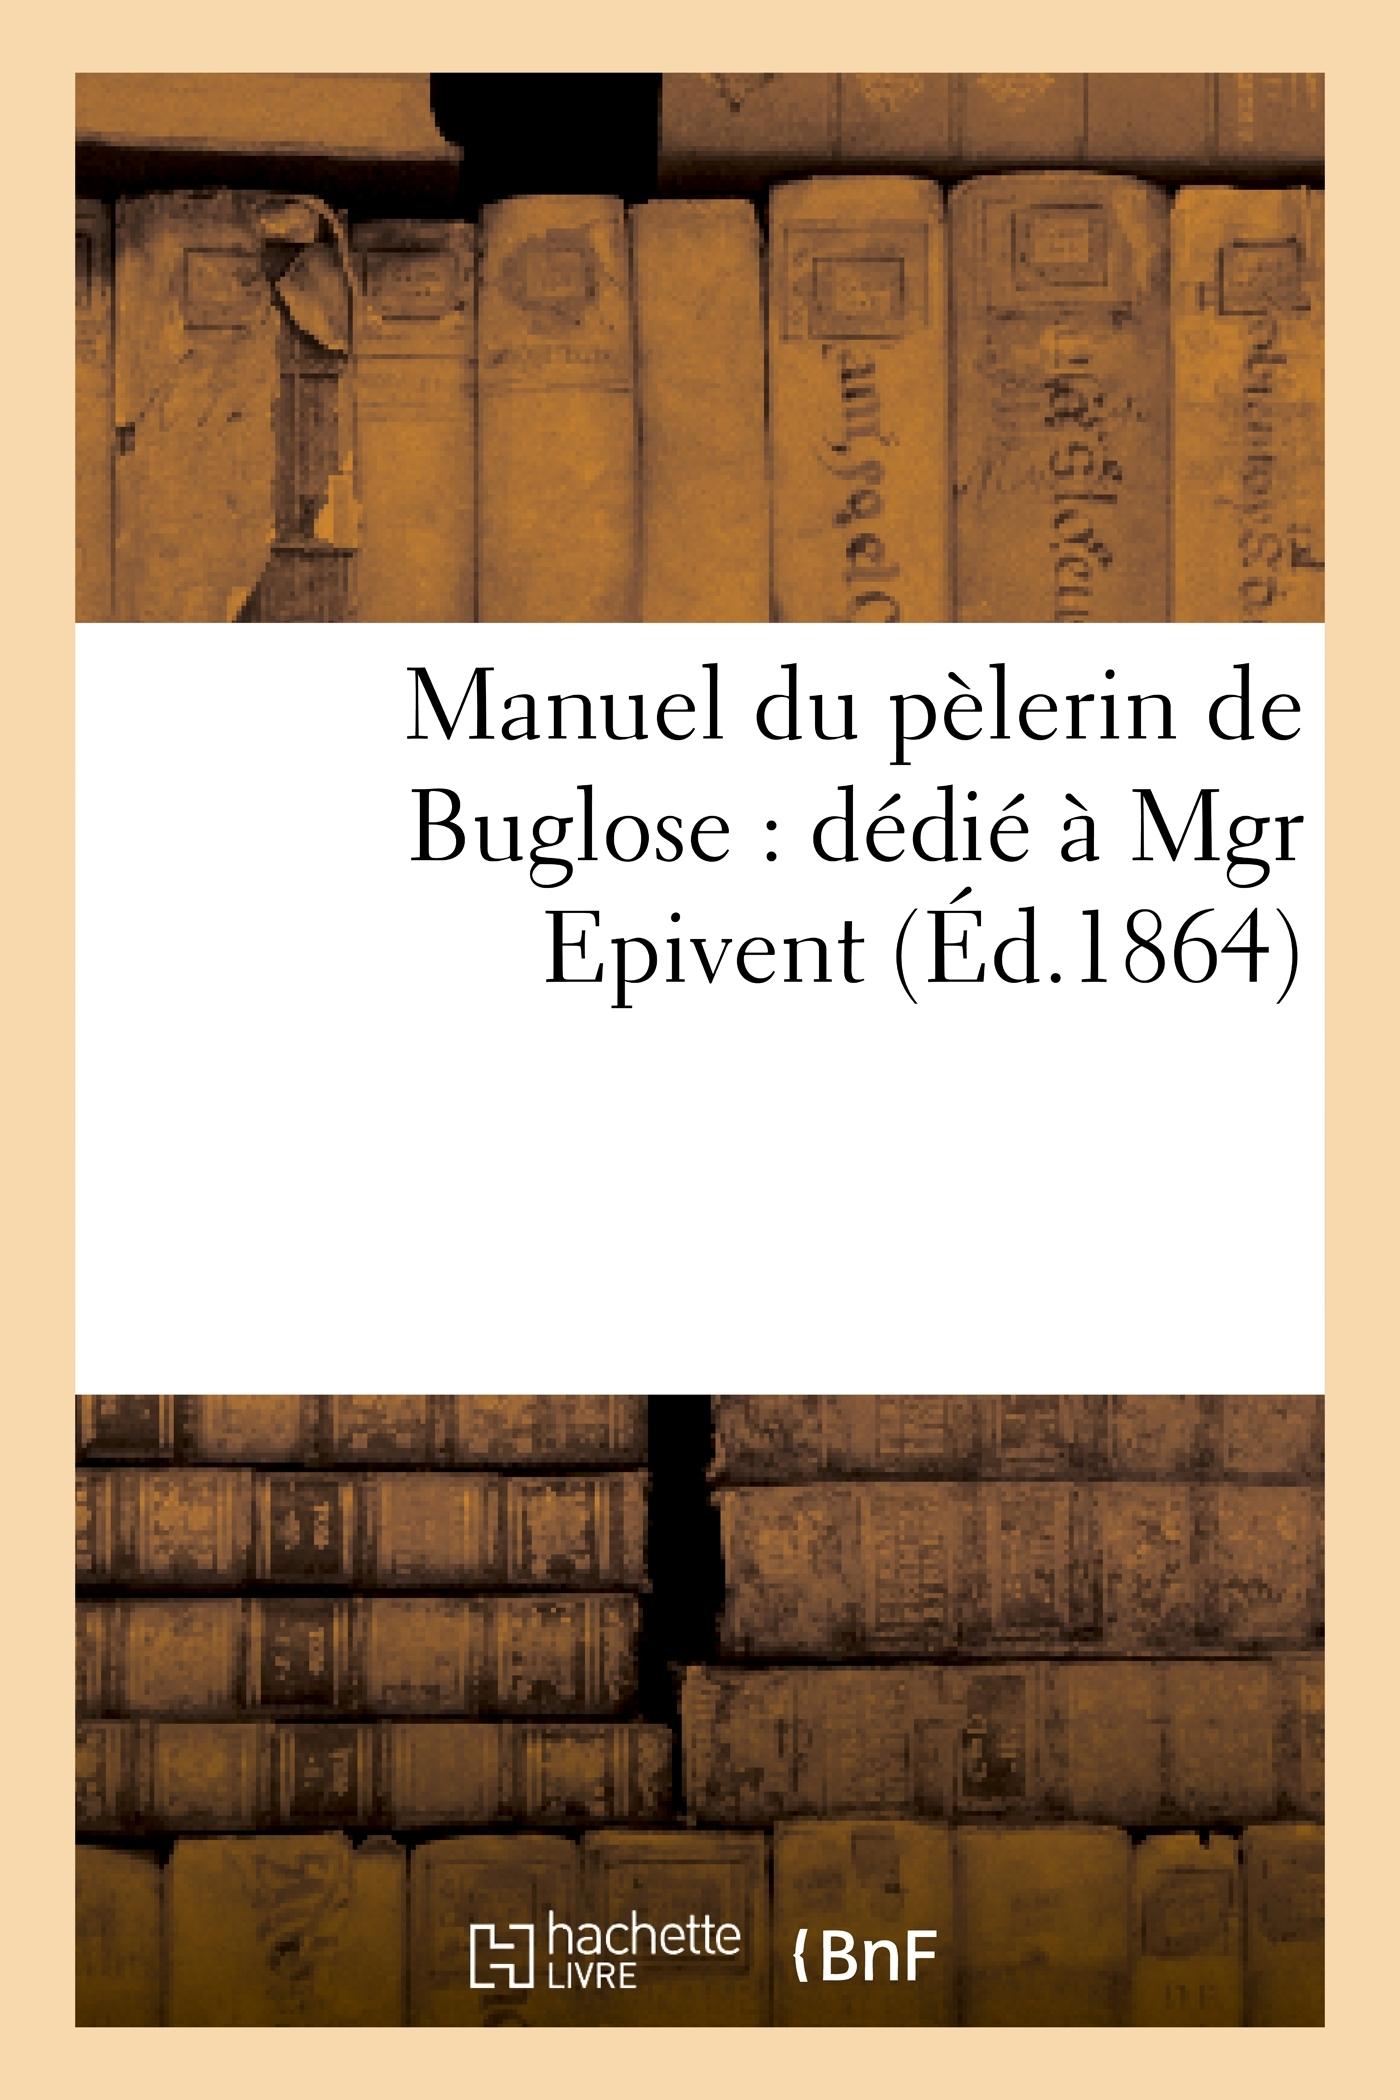 MANUEL DU PELERIN DE BUGLOSE : DEDIE A MGR EPIVENT